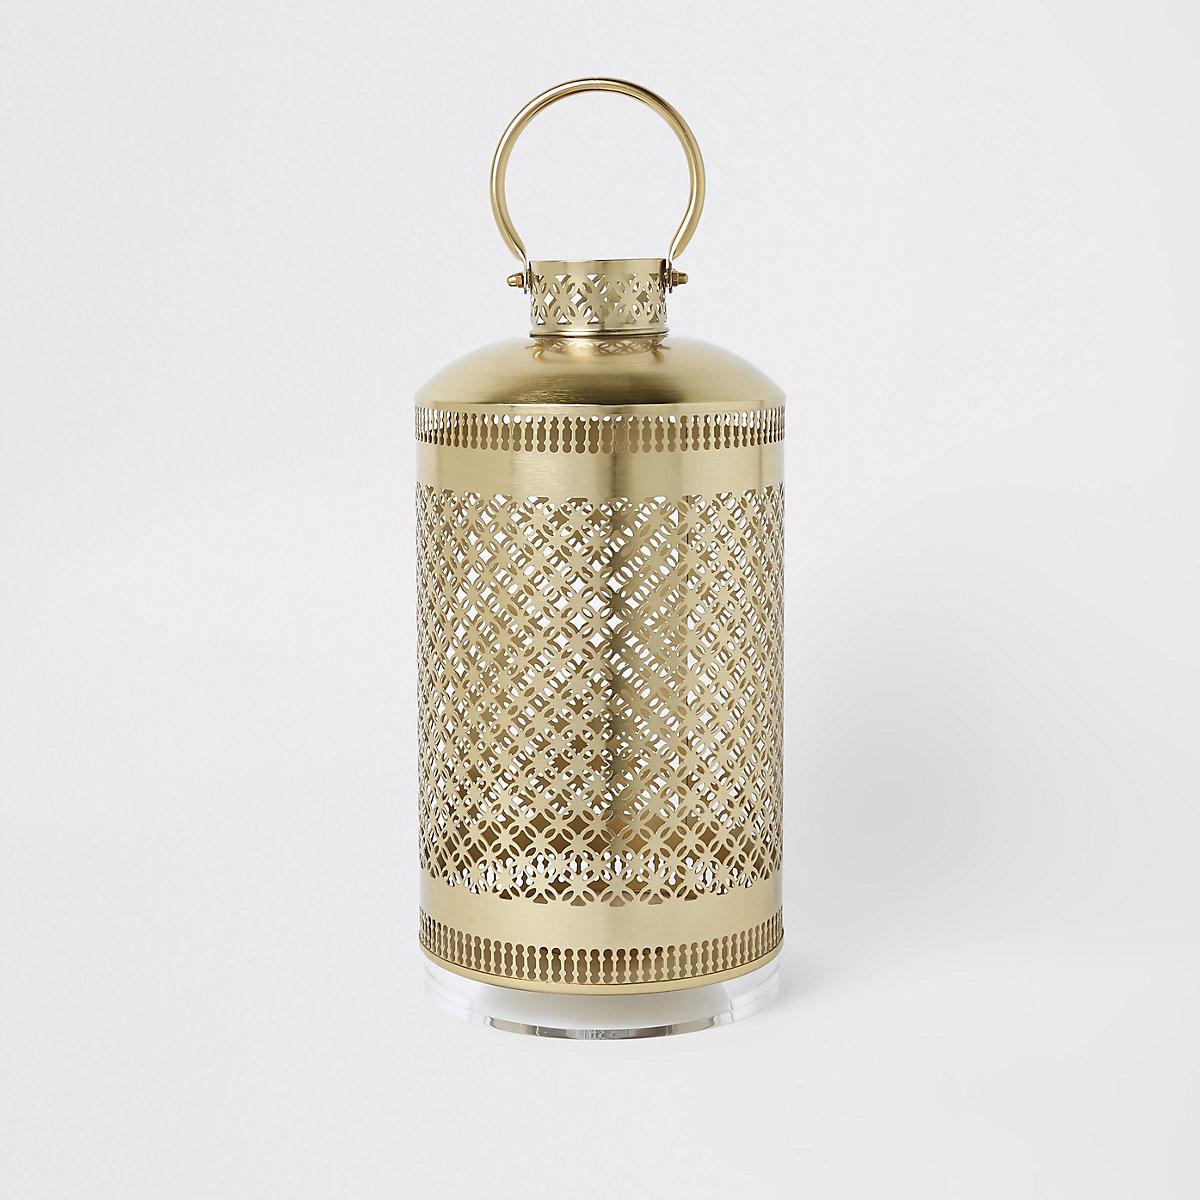 Grande lanterne en métal à base en perspex